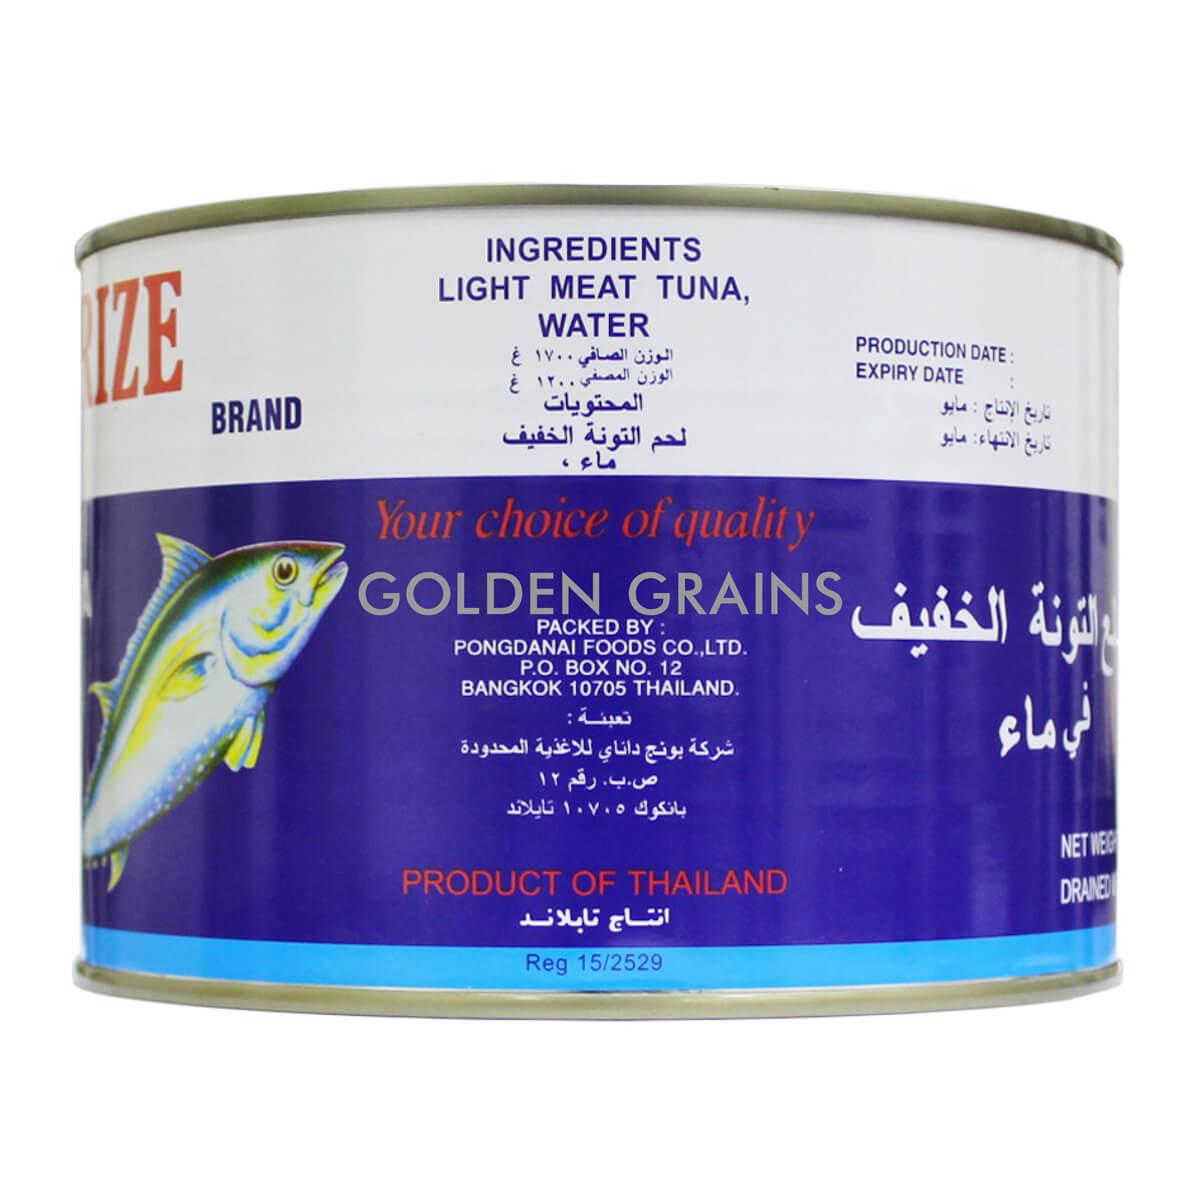 Golden Grains Golden Prize - Tuna in Veg Water 2017 - Back.jpg